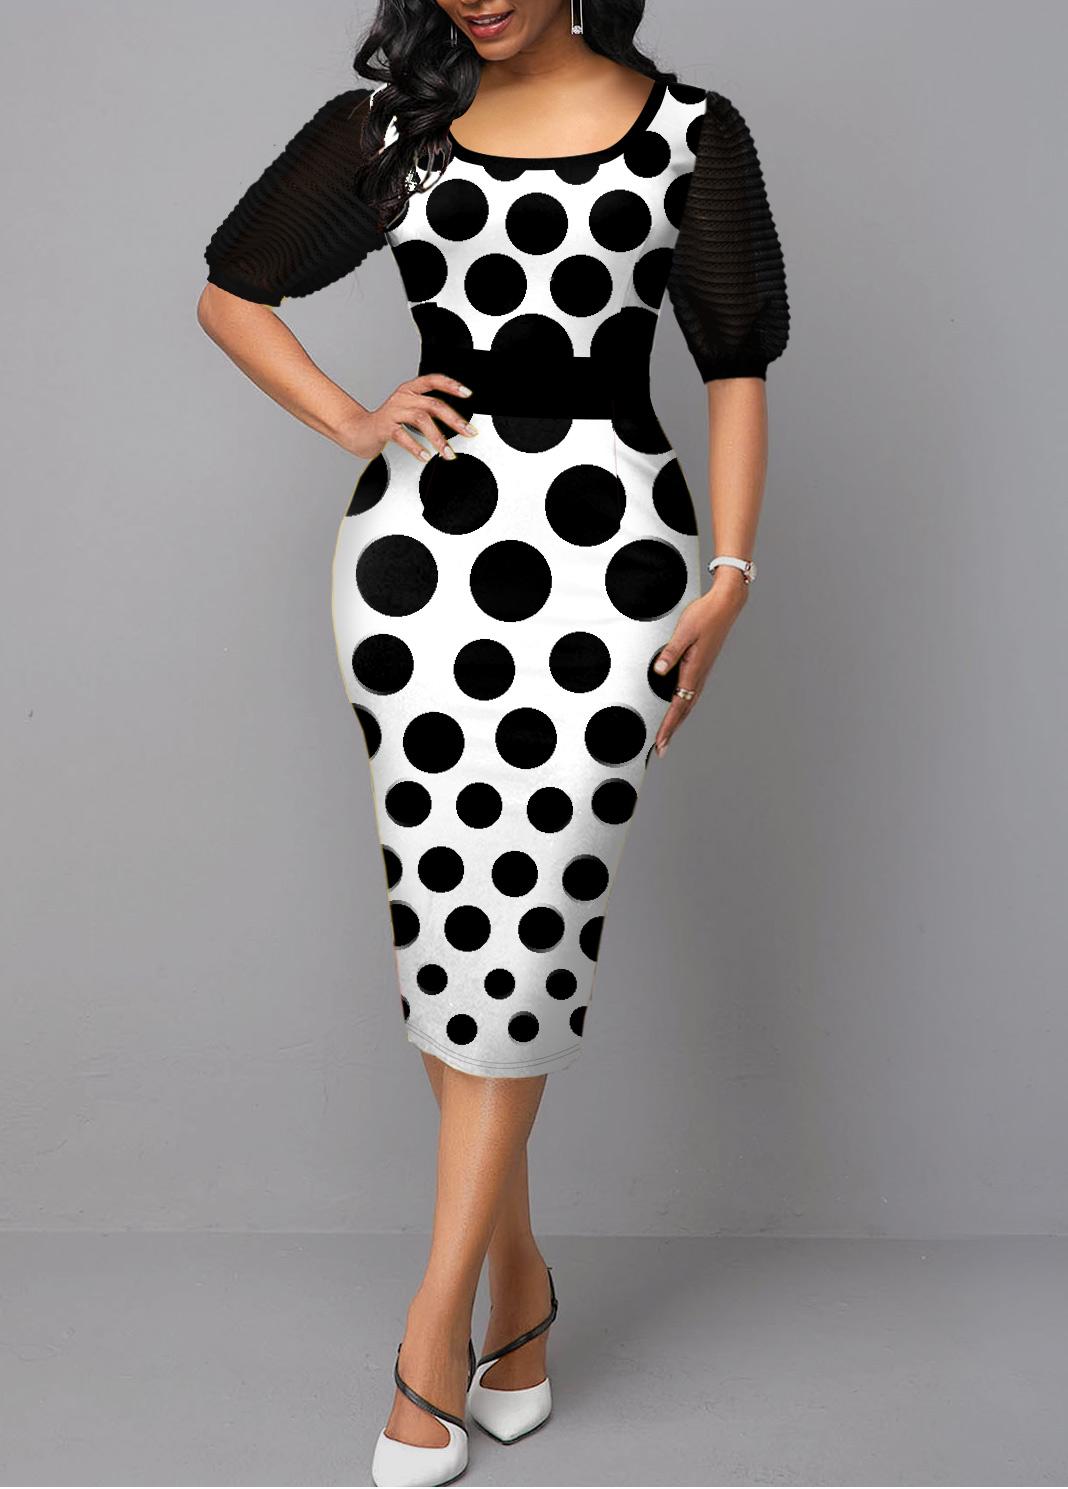 Polka Dot Print Half Sleeve Black Dress